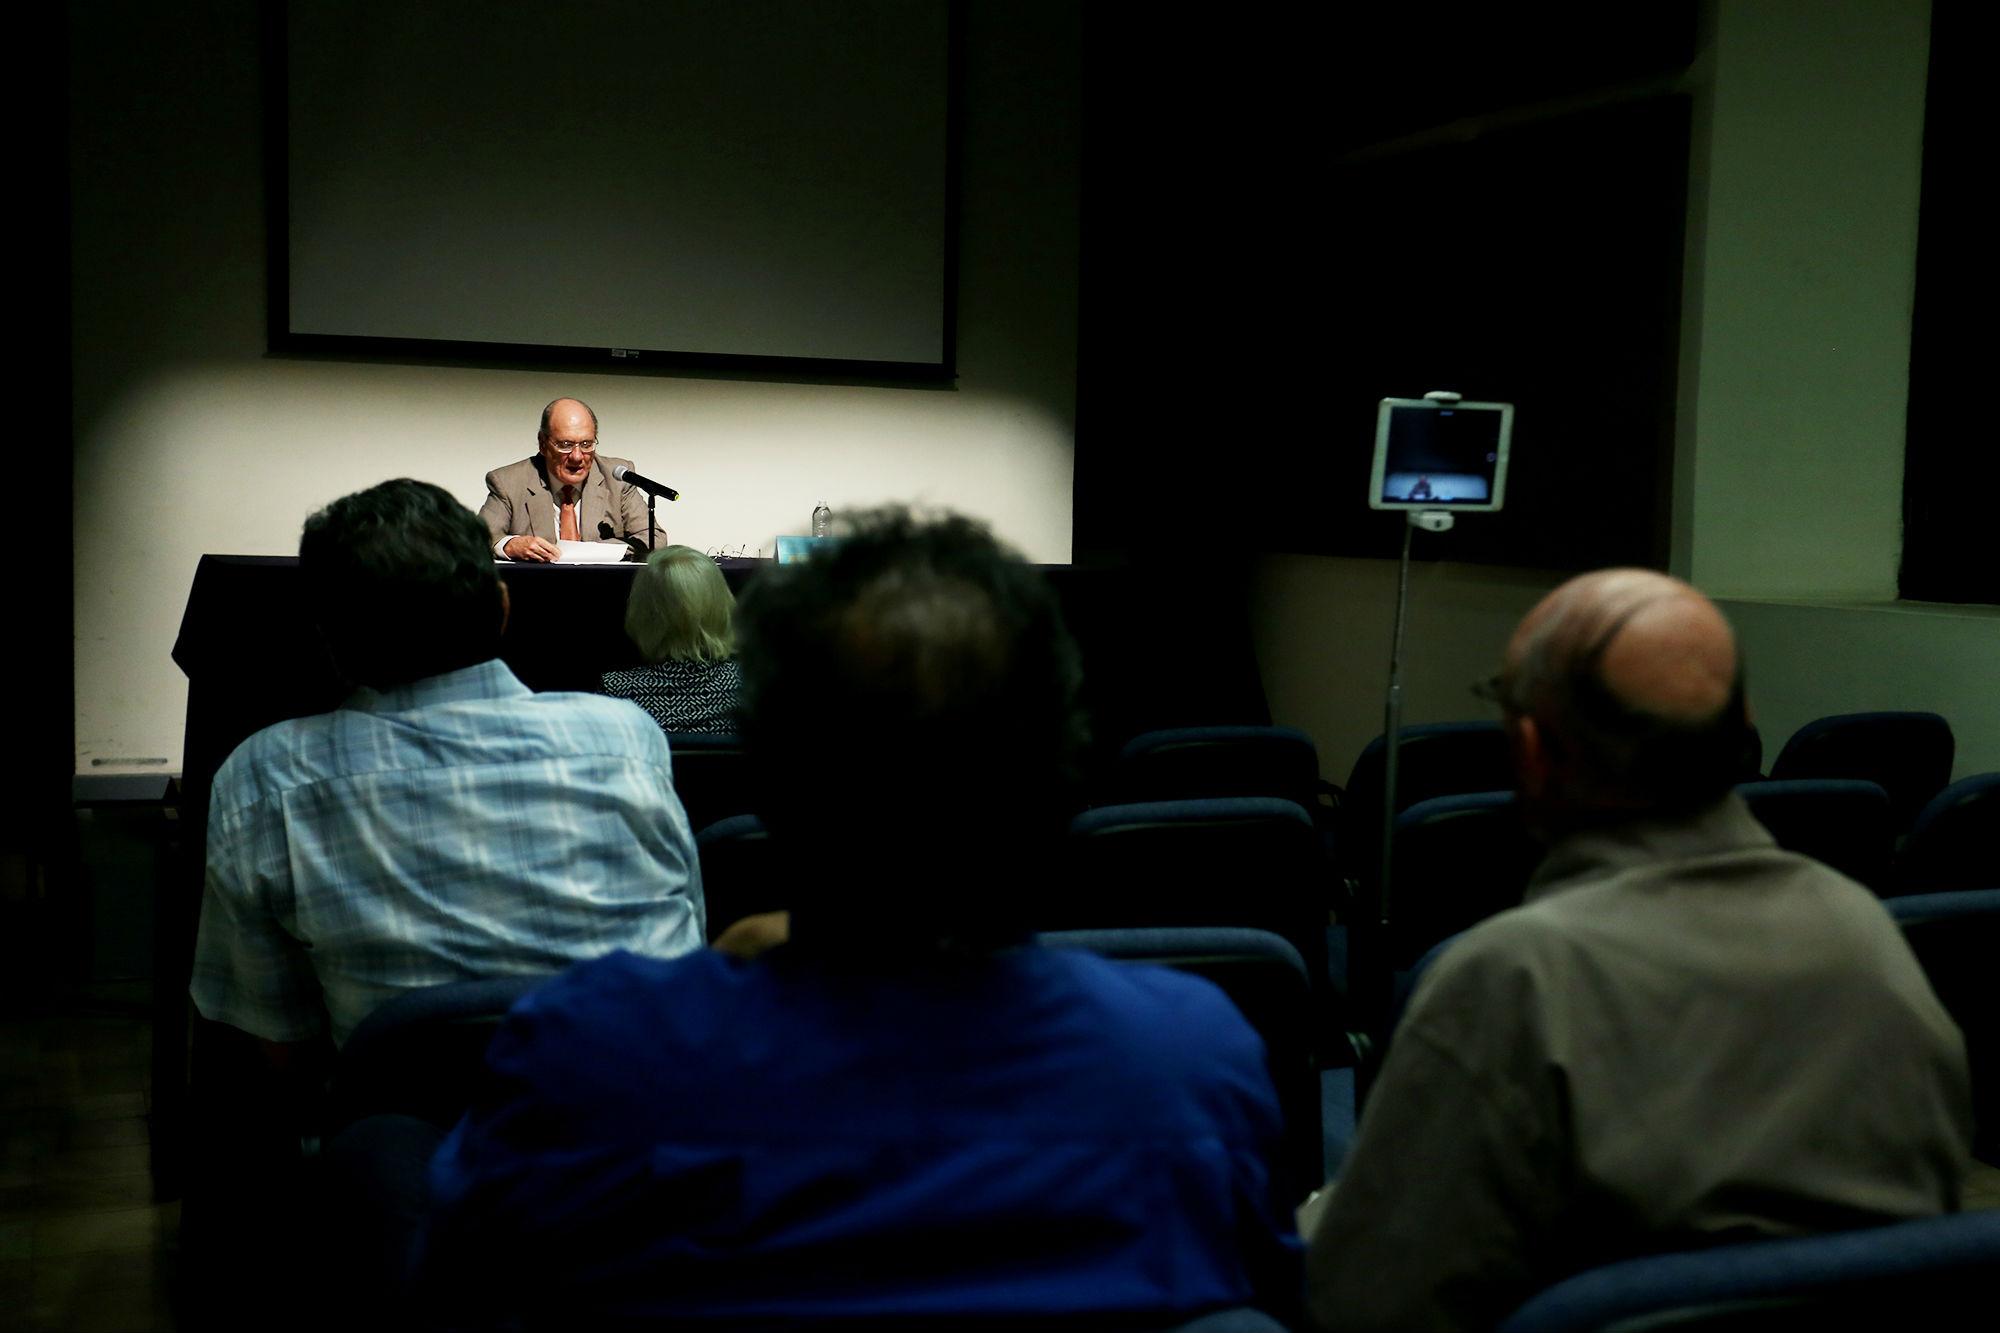 La conferencia se realizó en la sala Zertuche del Colegio Civil Centro Cultural Universitario